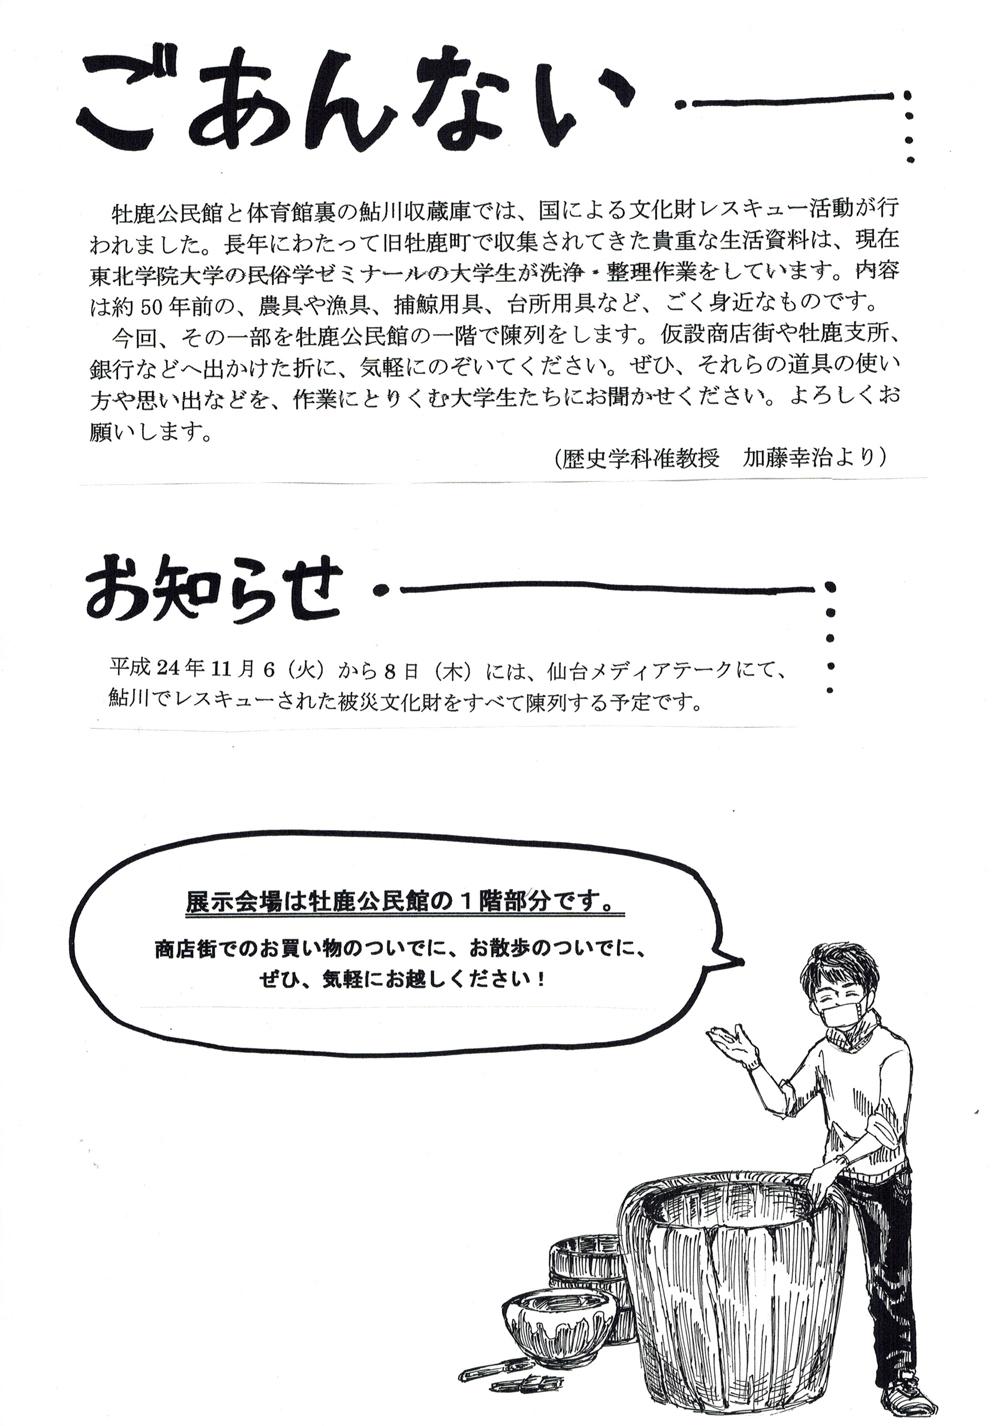 http://www.tohoku-gakuin.ac.jp/info/content/420120717_0001.jpg